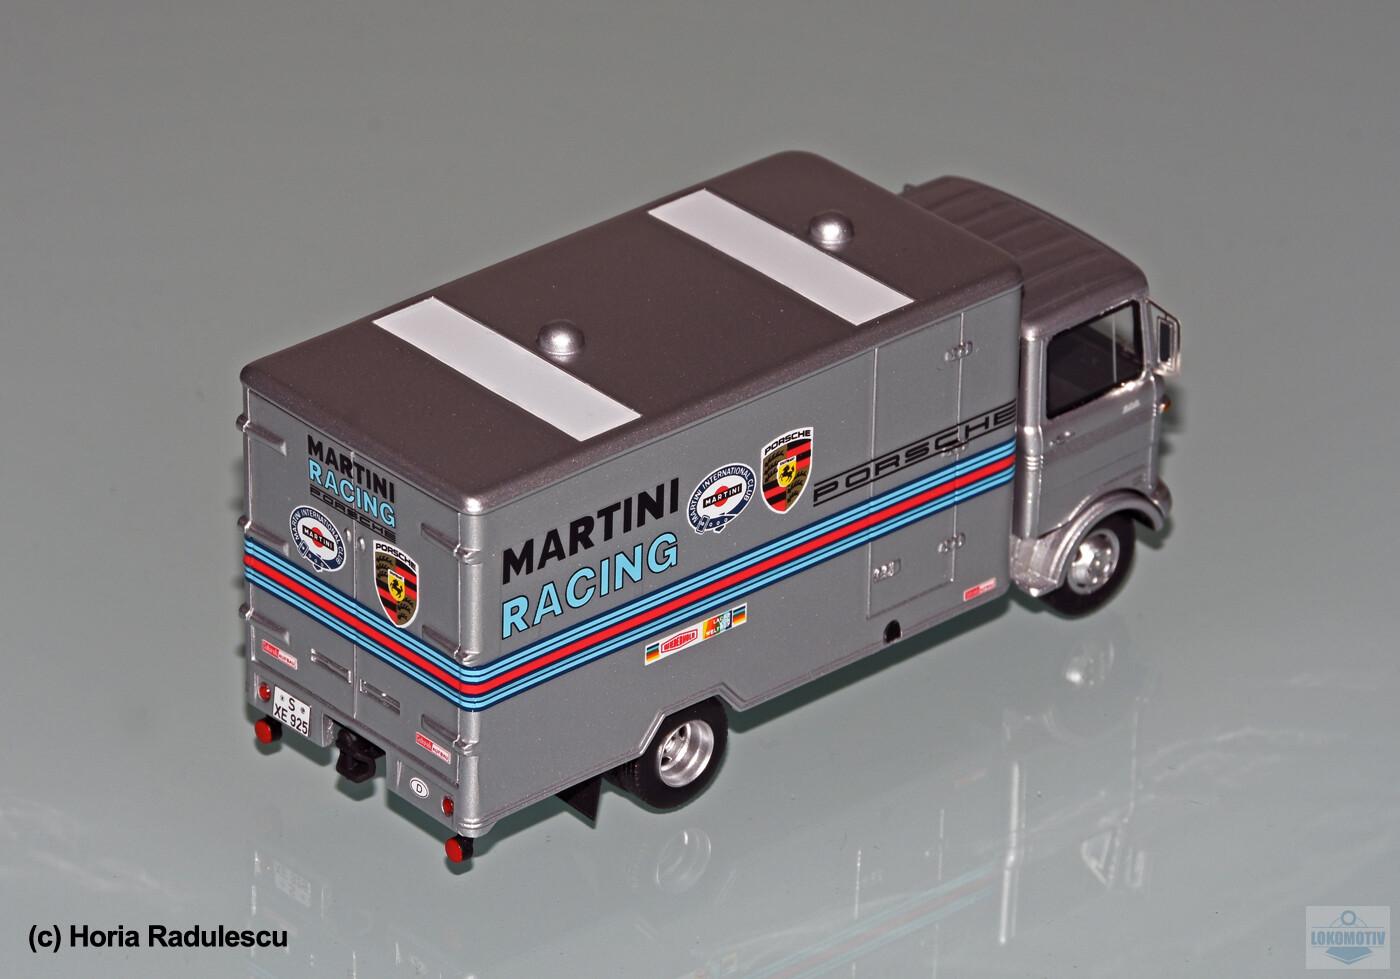 64-Martini-Racing-MB-LP-608-ScaleMini-2db51af76ee569fcc.jpg